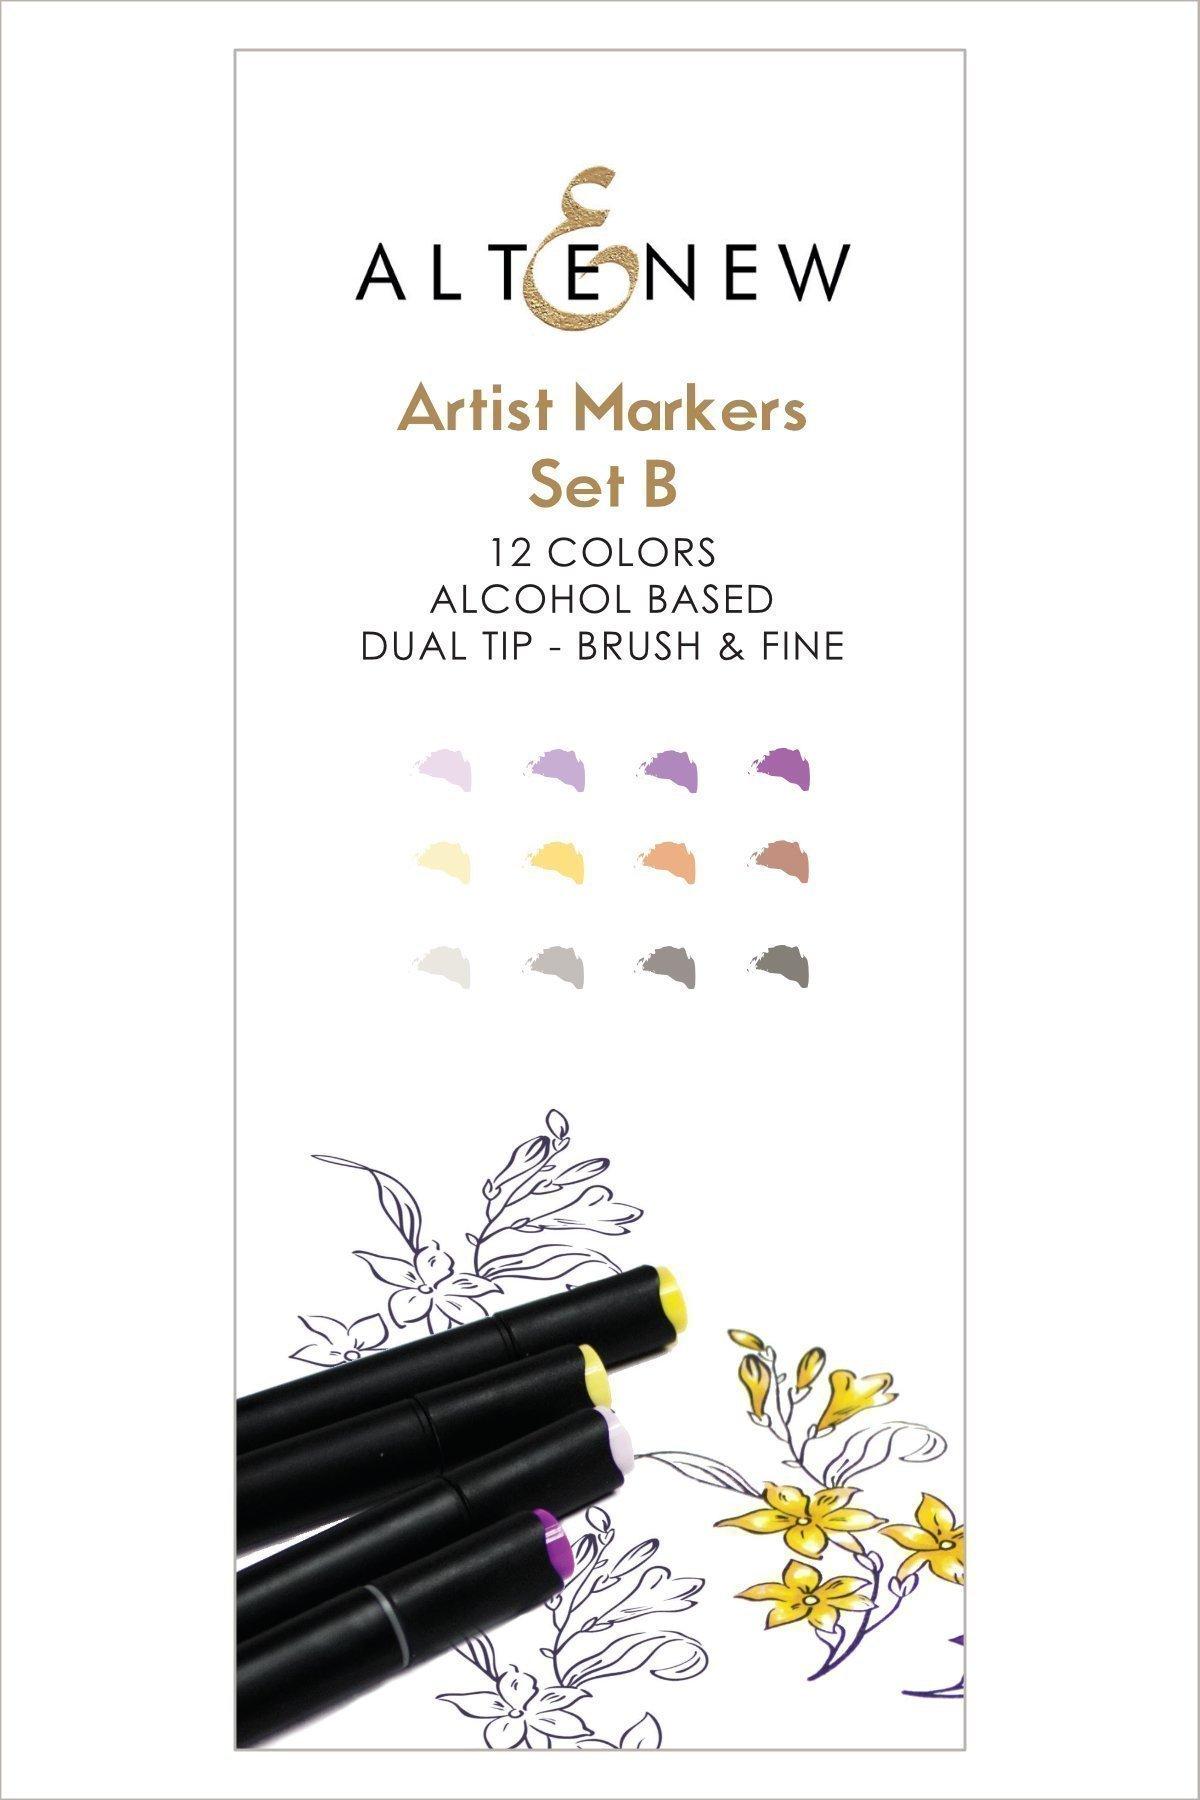 Altenew Artist Markers Set B